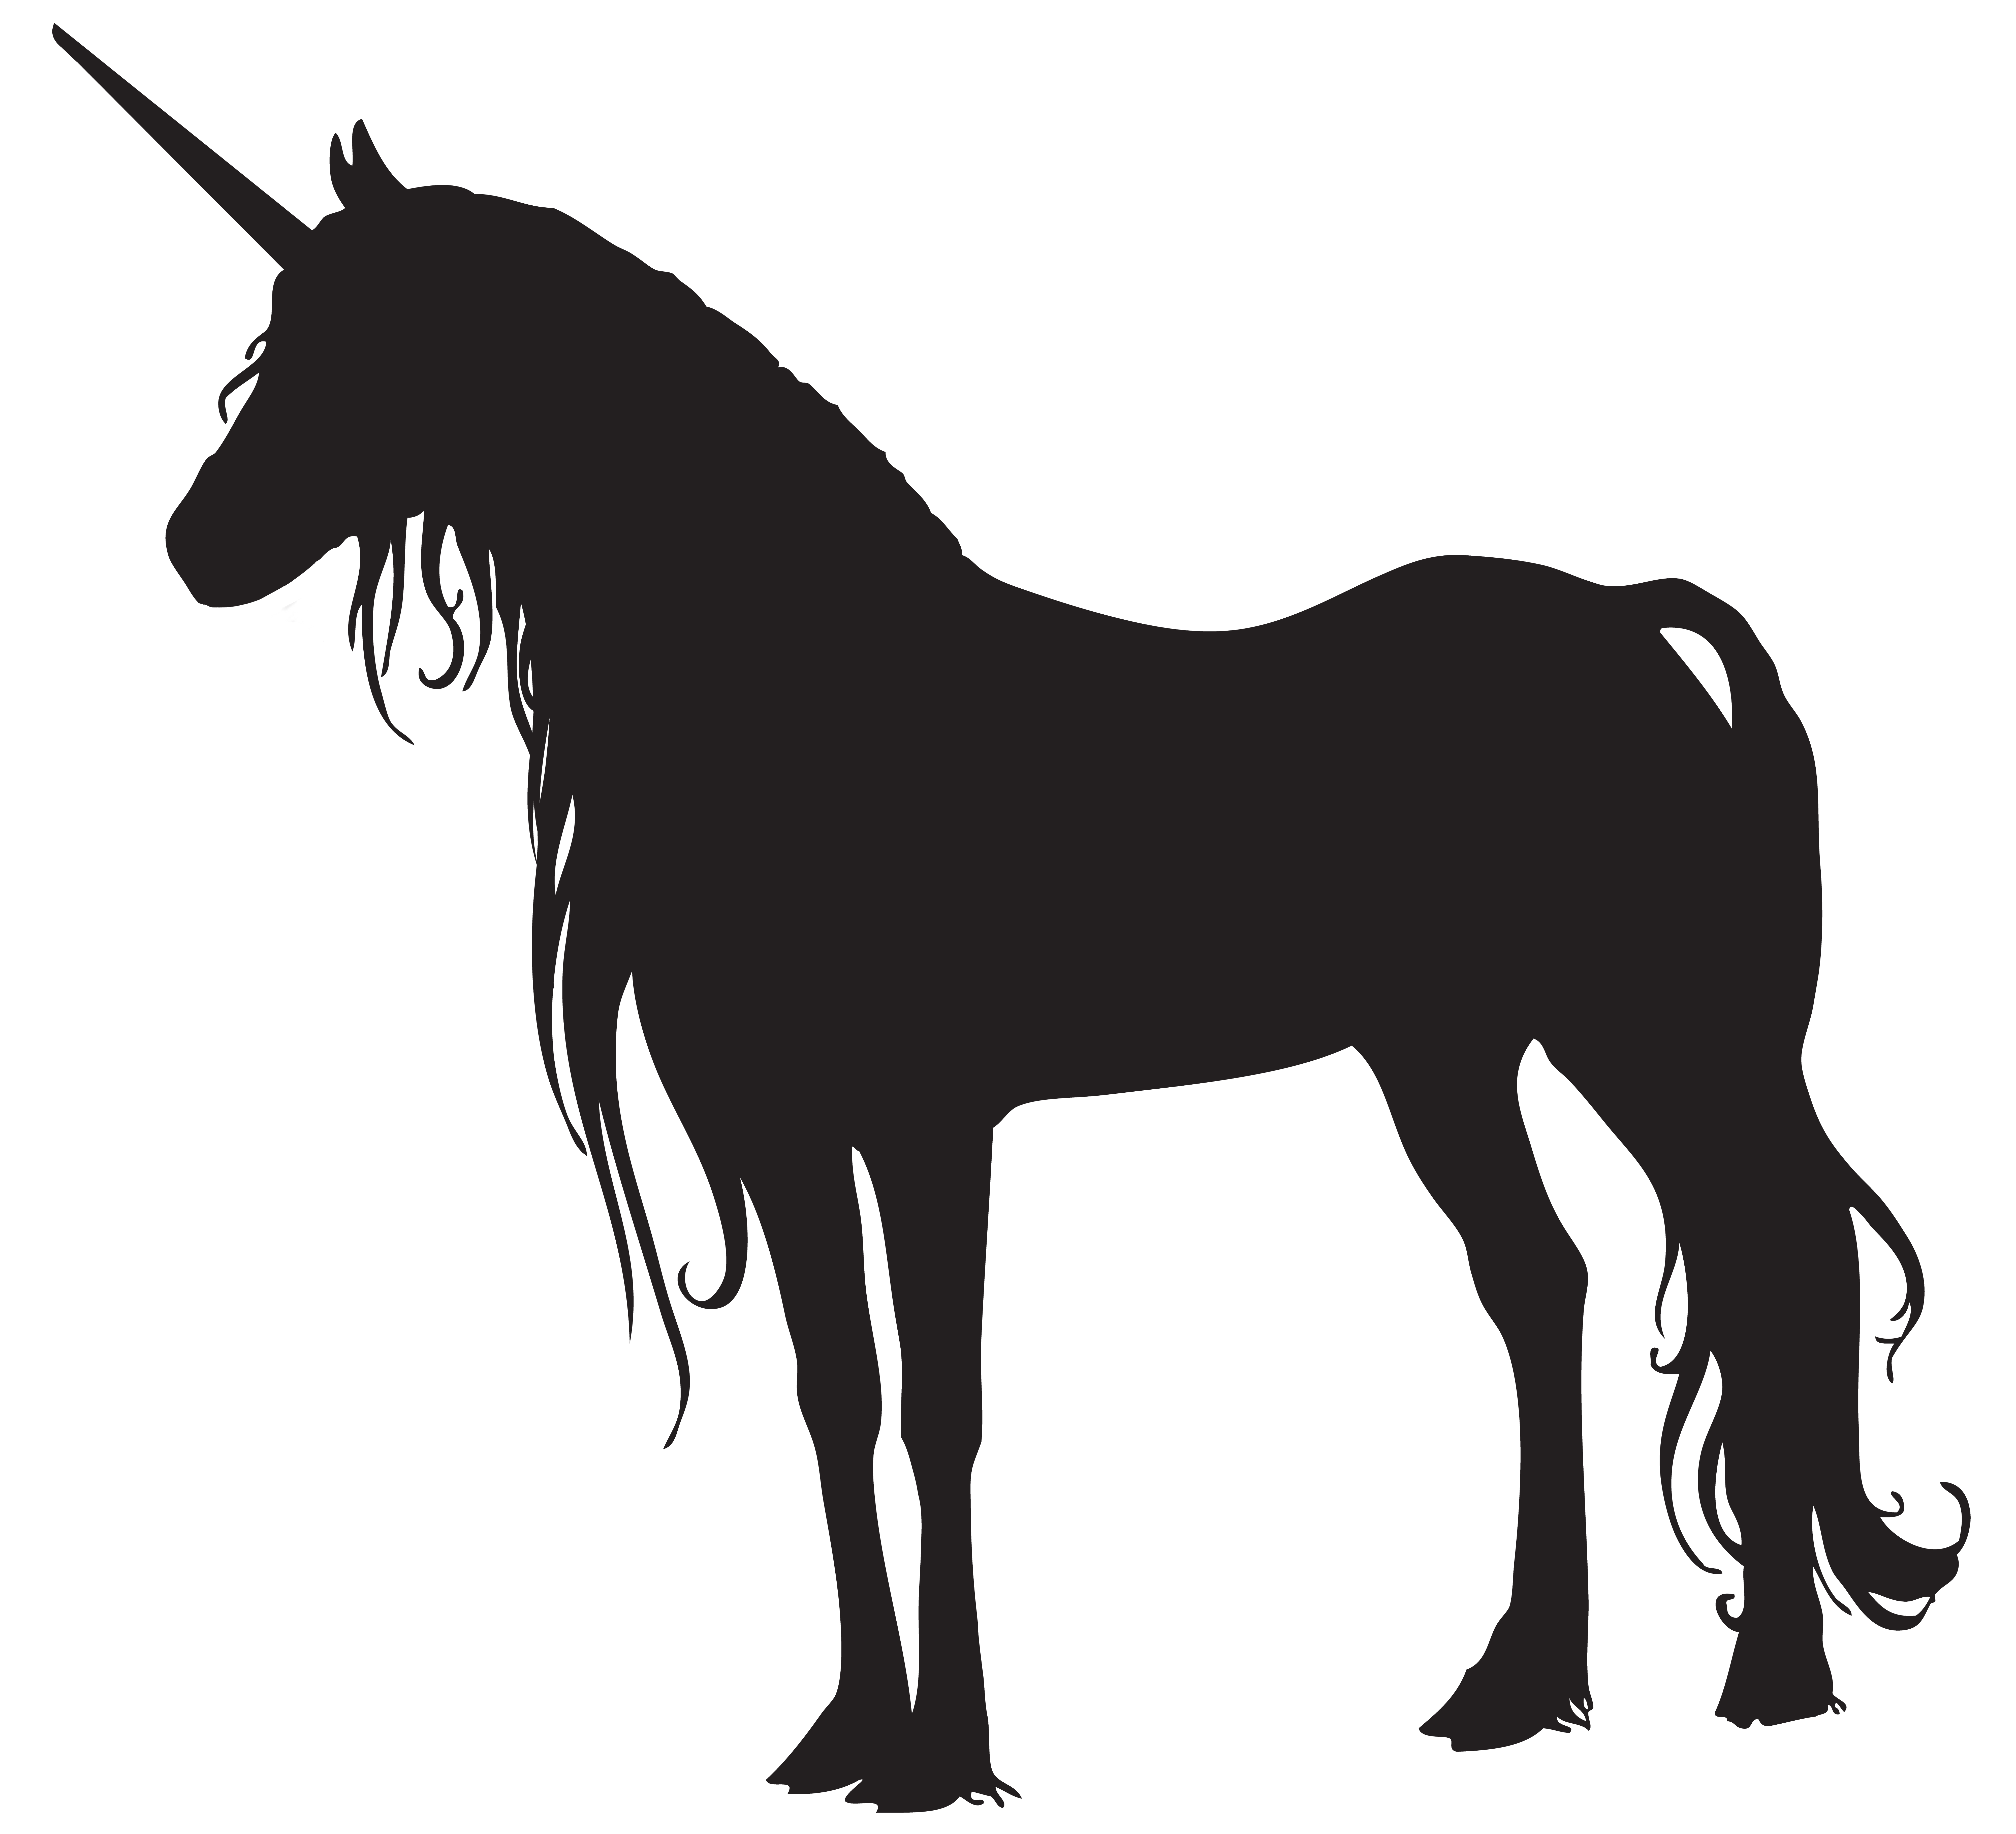 Unicorn horses clipart vector free download Silhouette Unicorn Horse Clip art - unicorn png download ... vector free download